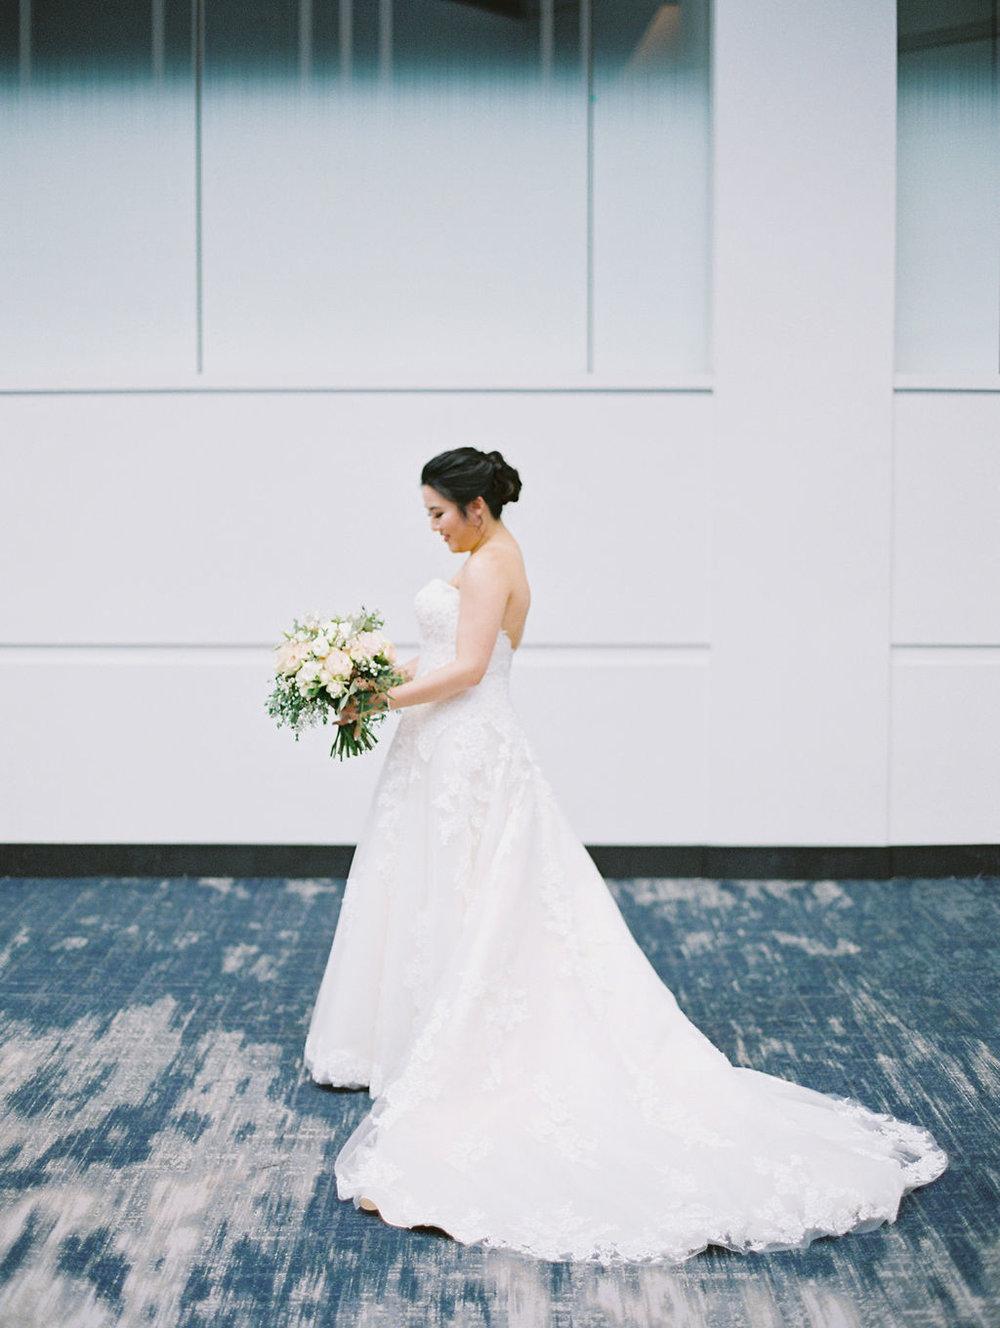 JennySoiPhotography-S&SSFAirportWeddingBrideandGroom-100.jpgSan Francisco Fairmont Hotel Wedding Fine Art Film Wedding Photographer